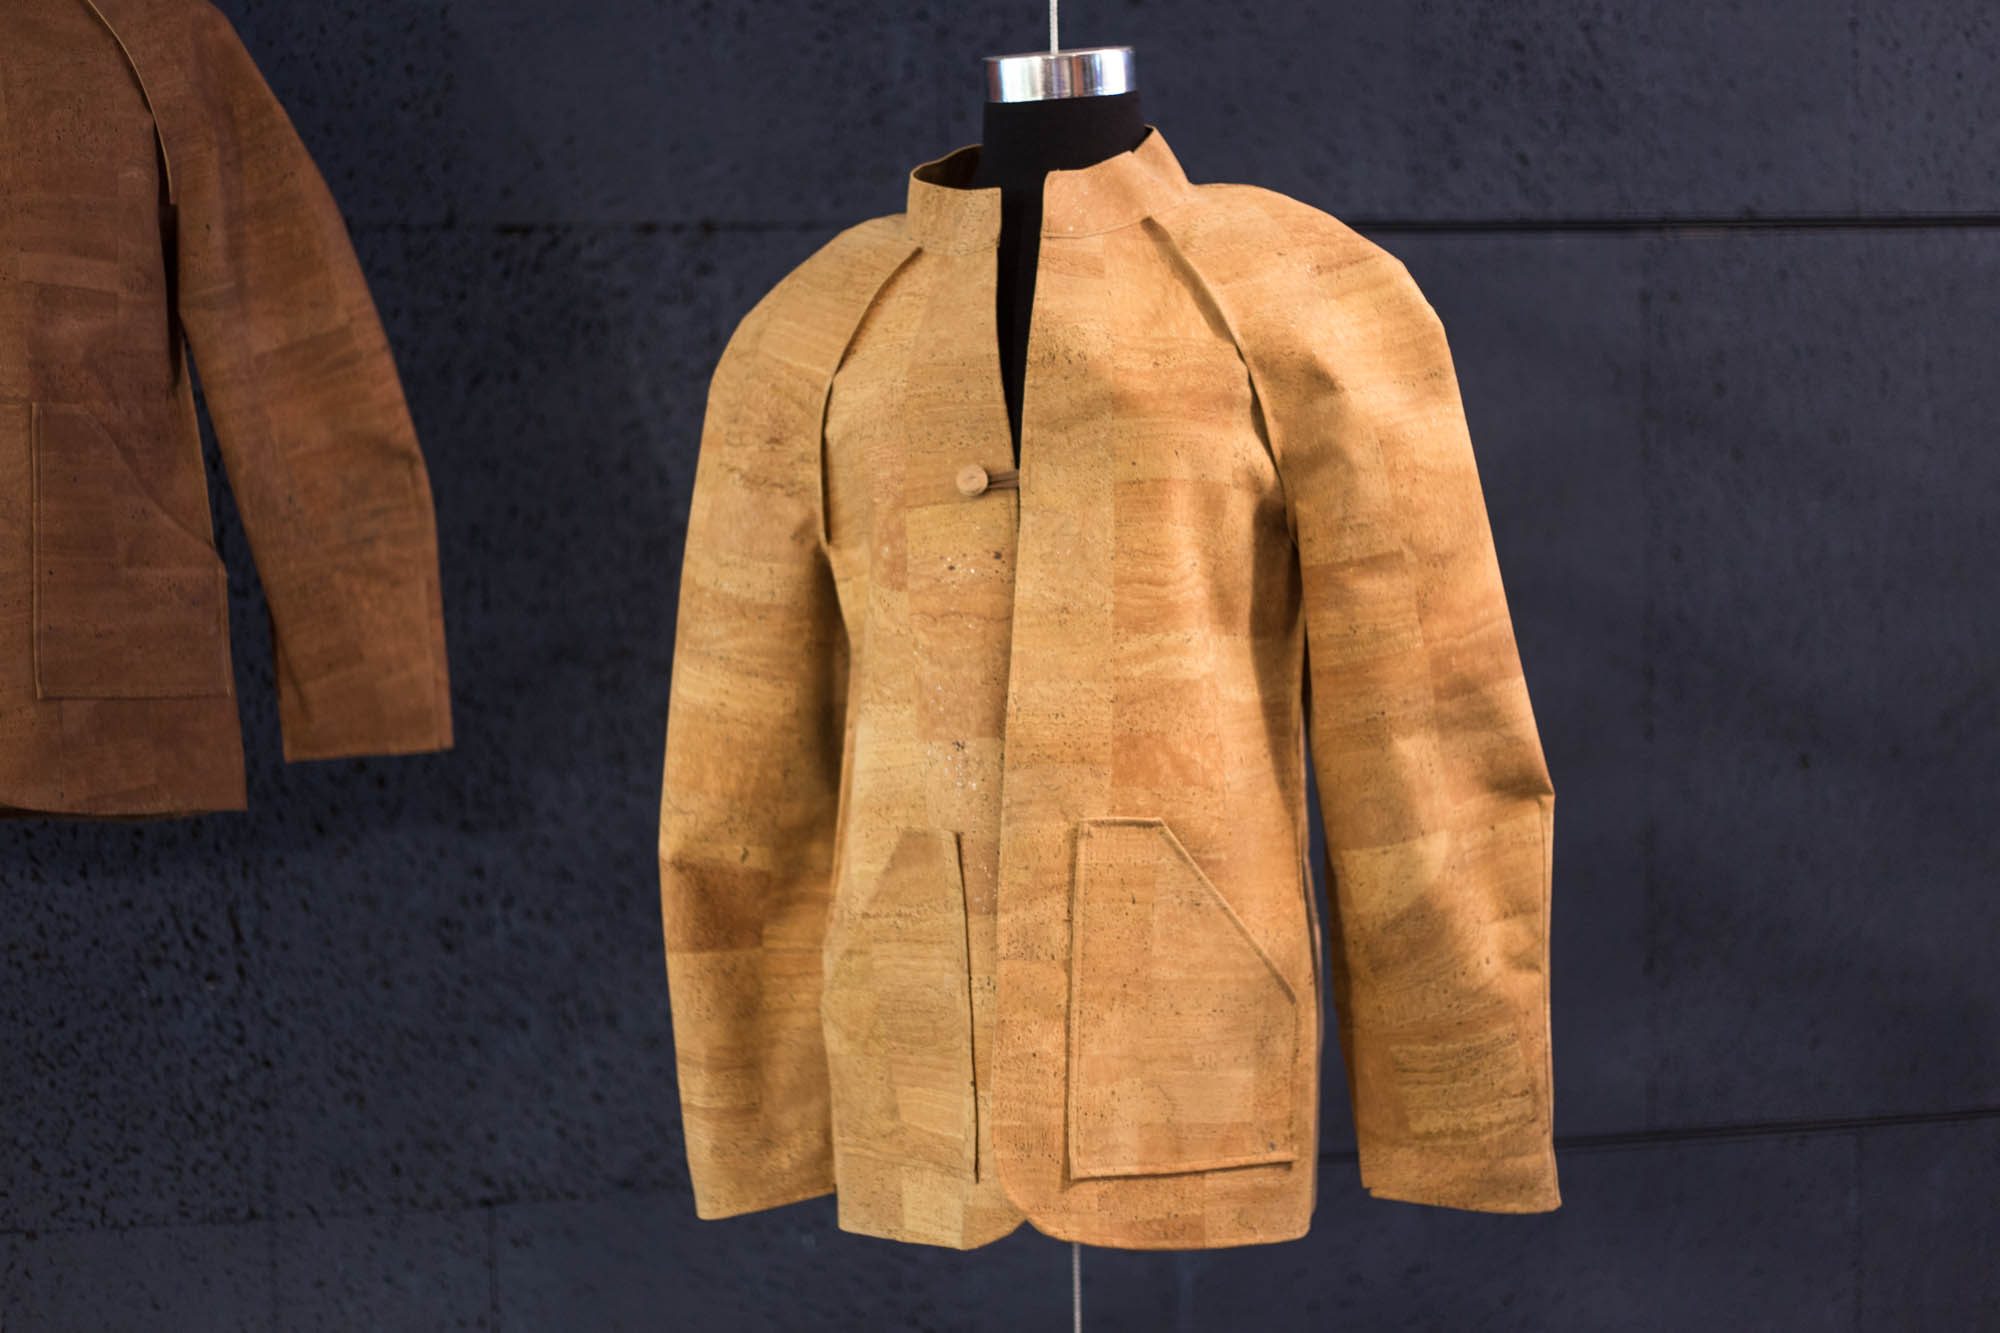 Todd Bracher's Amorim cork jacket